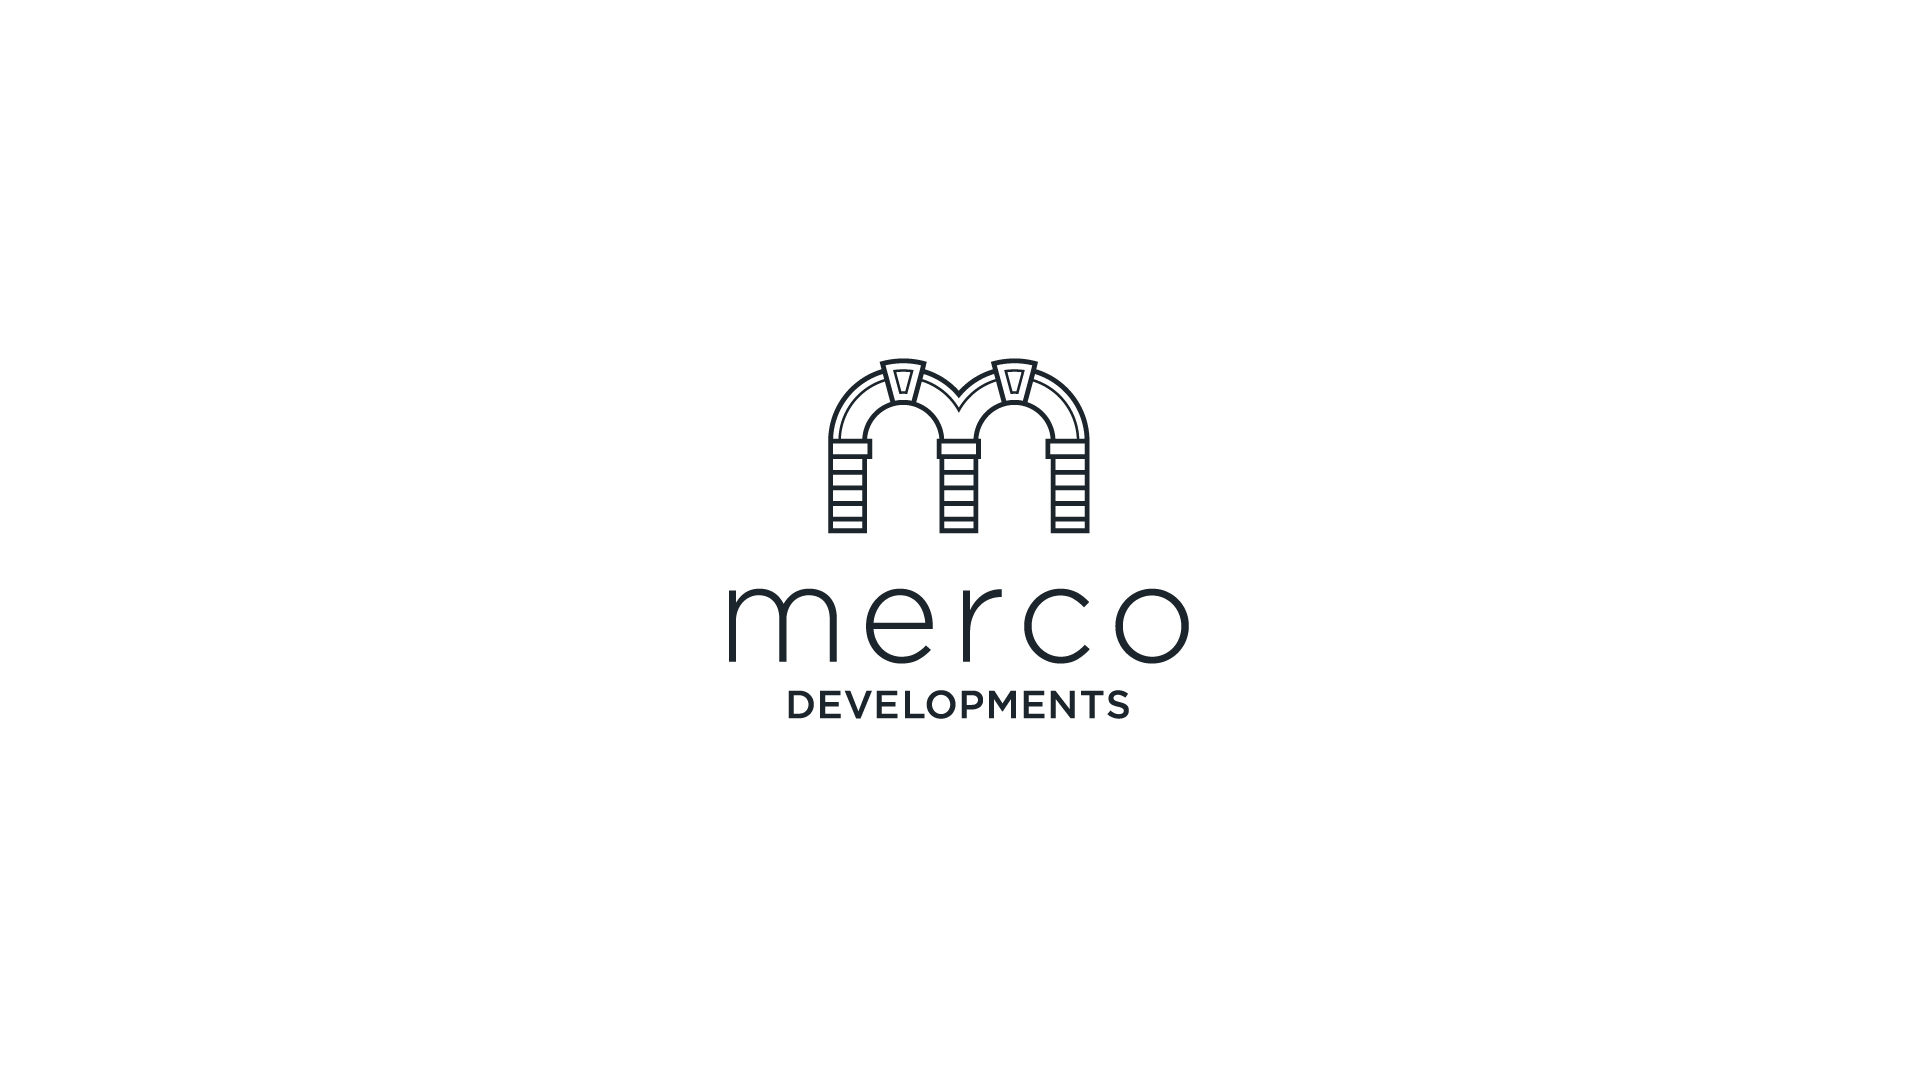 Merco-developments-logo-negative